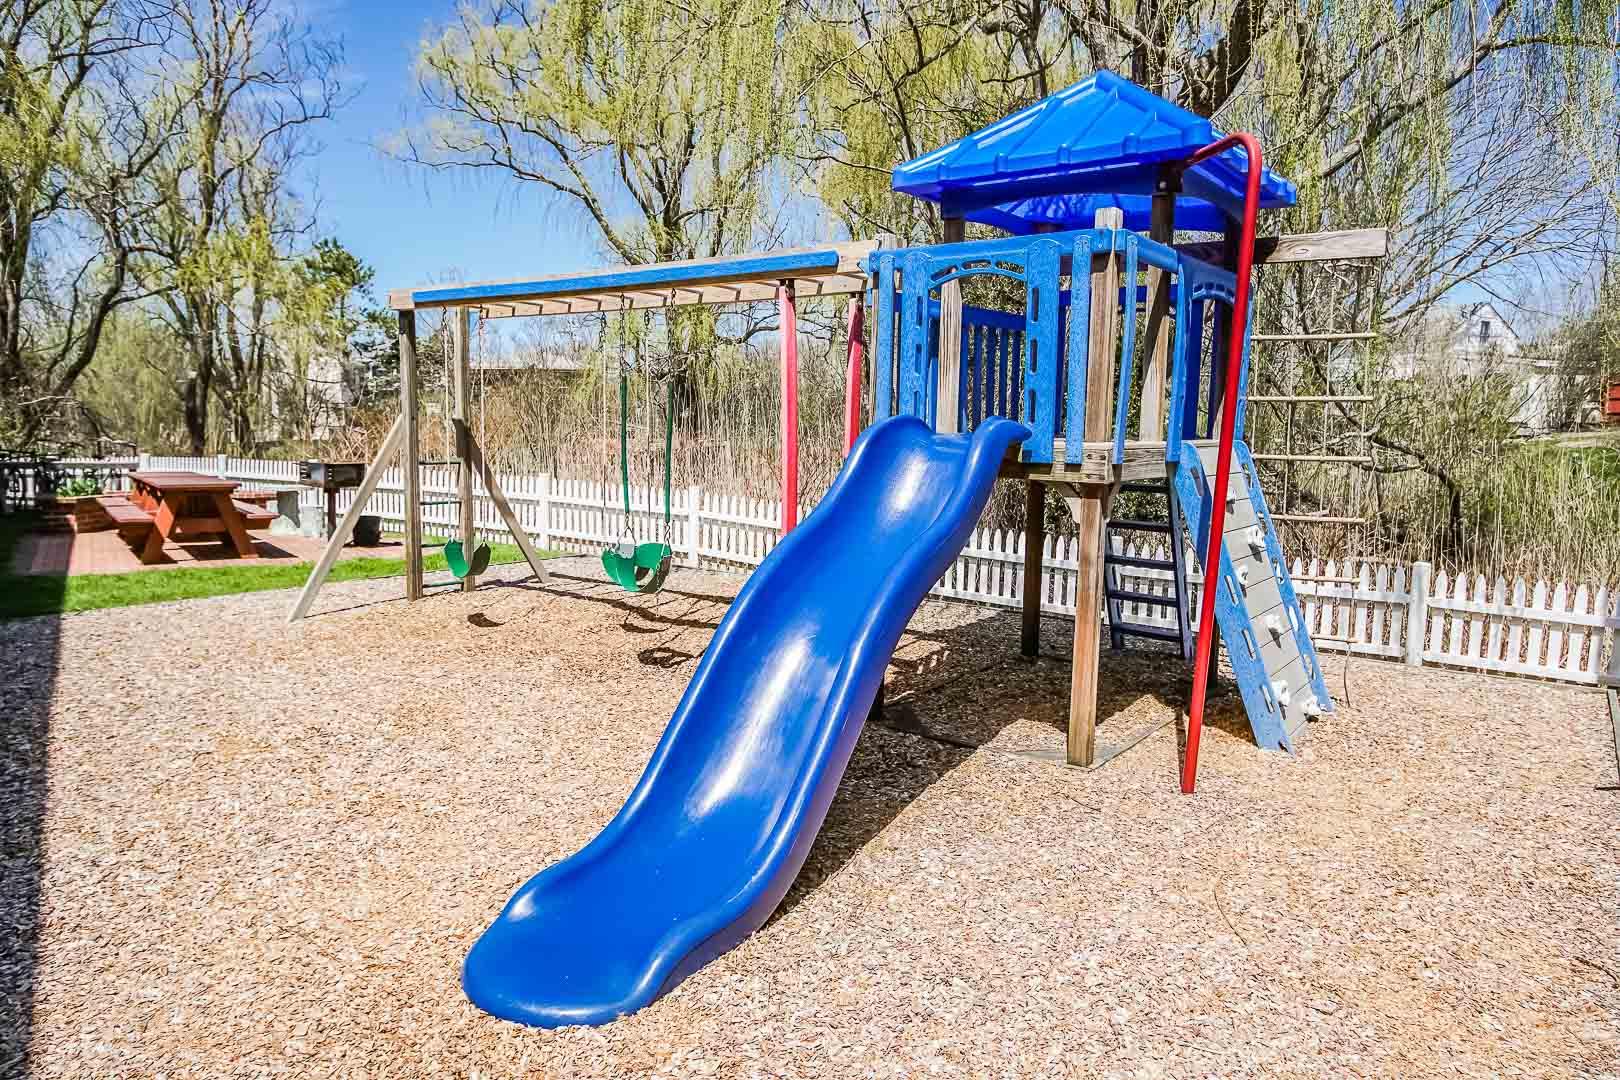 A colorful children's playground at VRI's Island Manor Resort in Rhode Island.